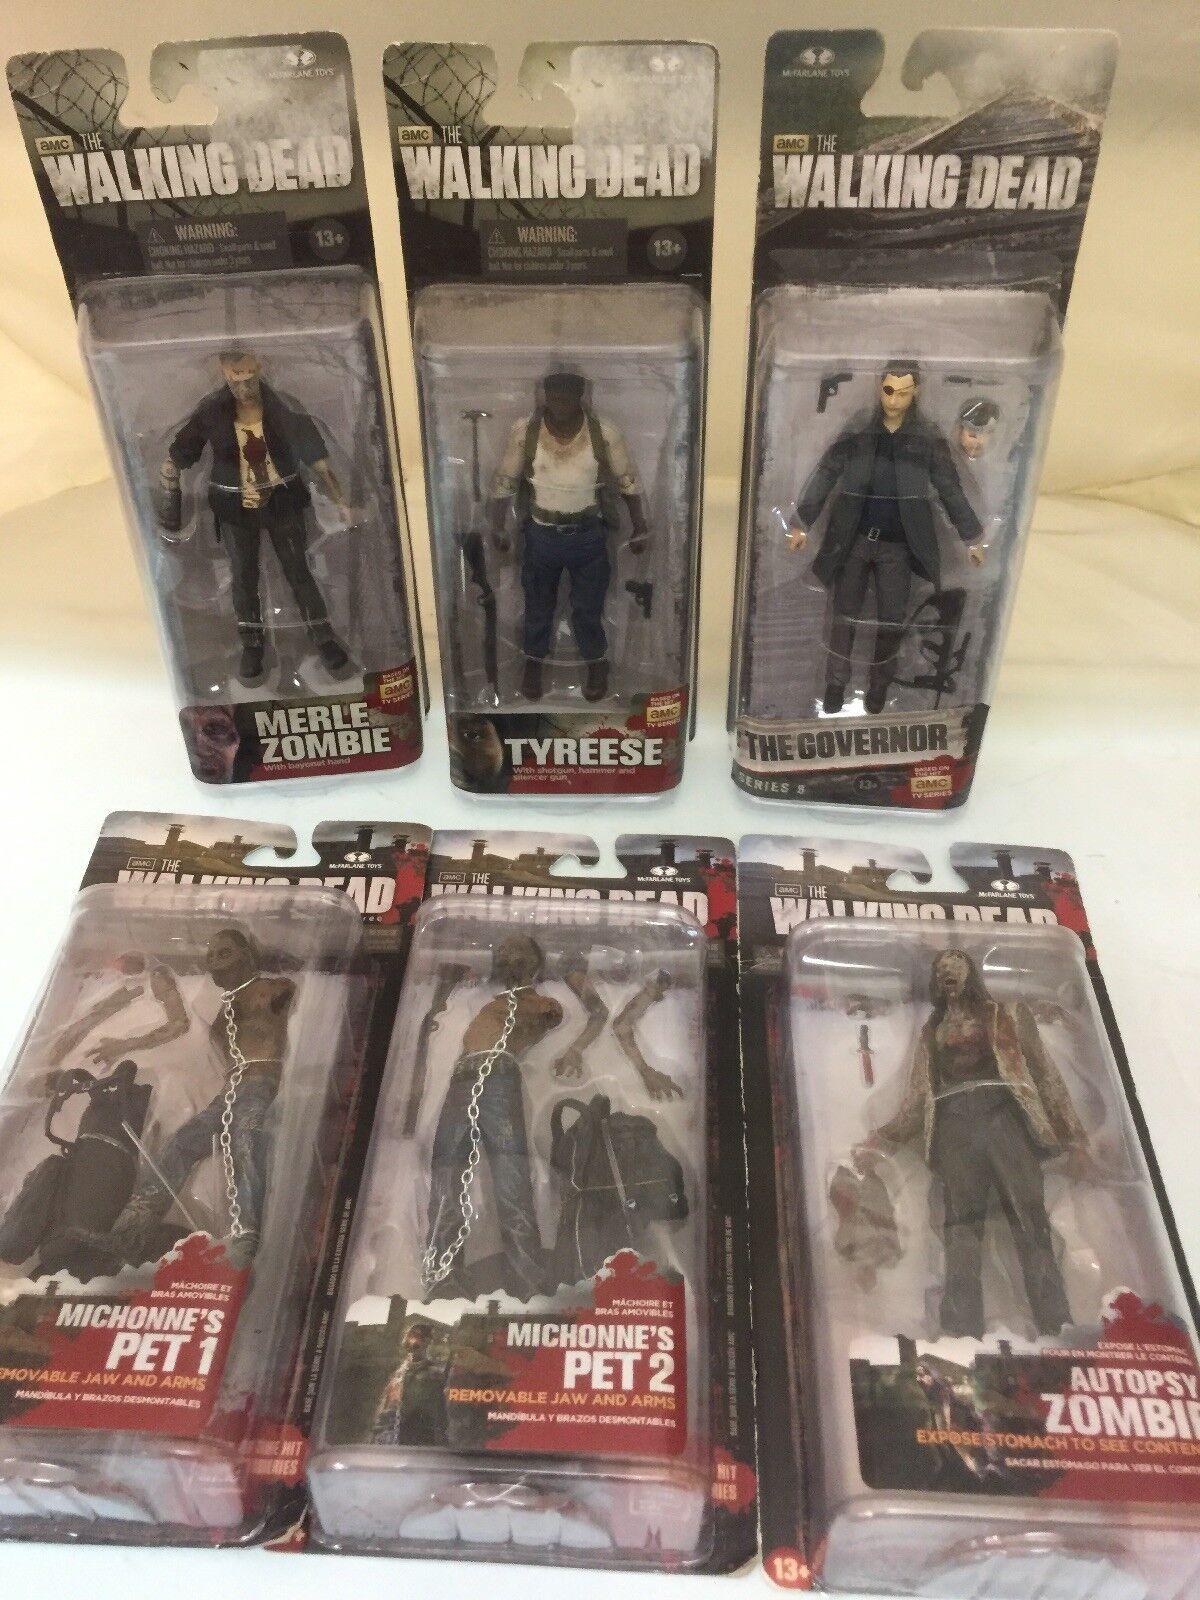 The Walking Dead Dead Dead 6 Figures Michonne's Pet 1 & 2 Zombies Governor Tyreese d36a54